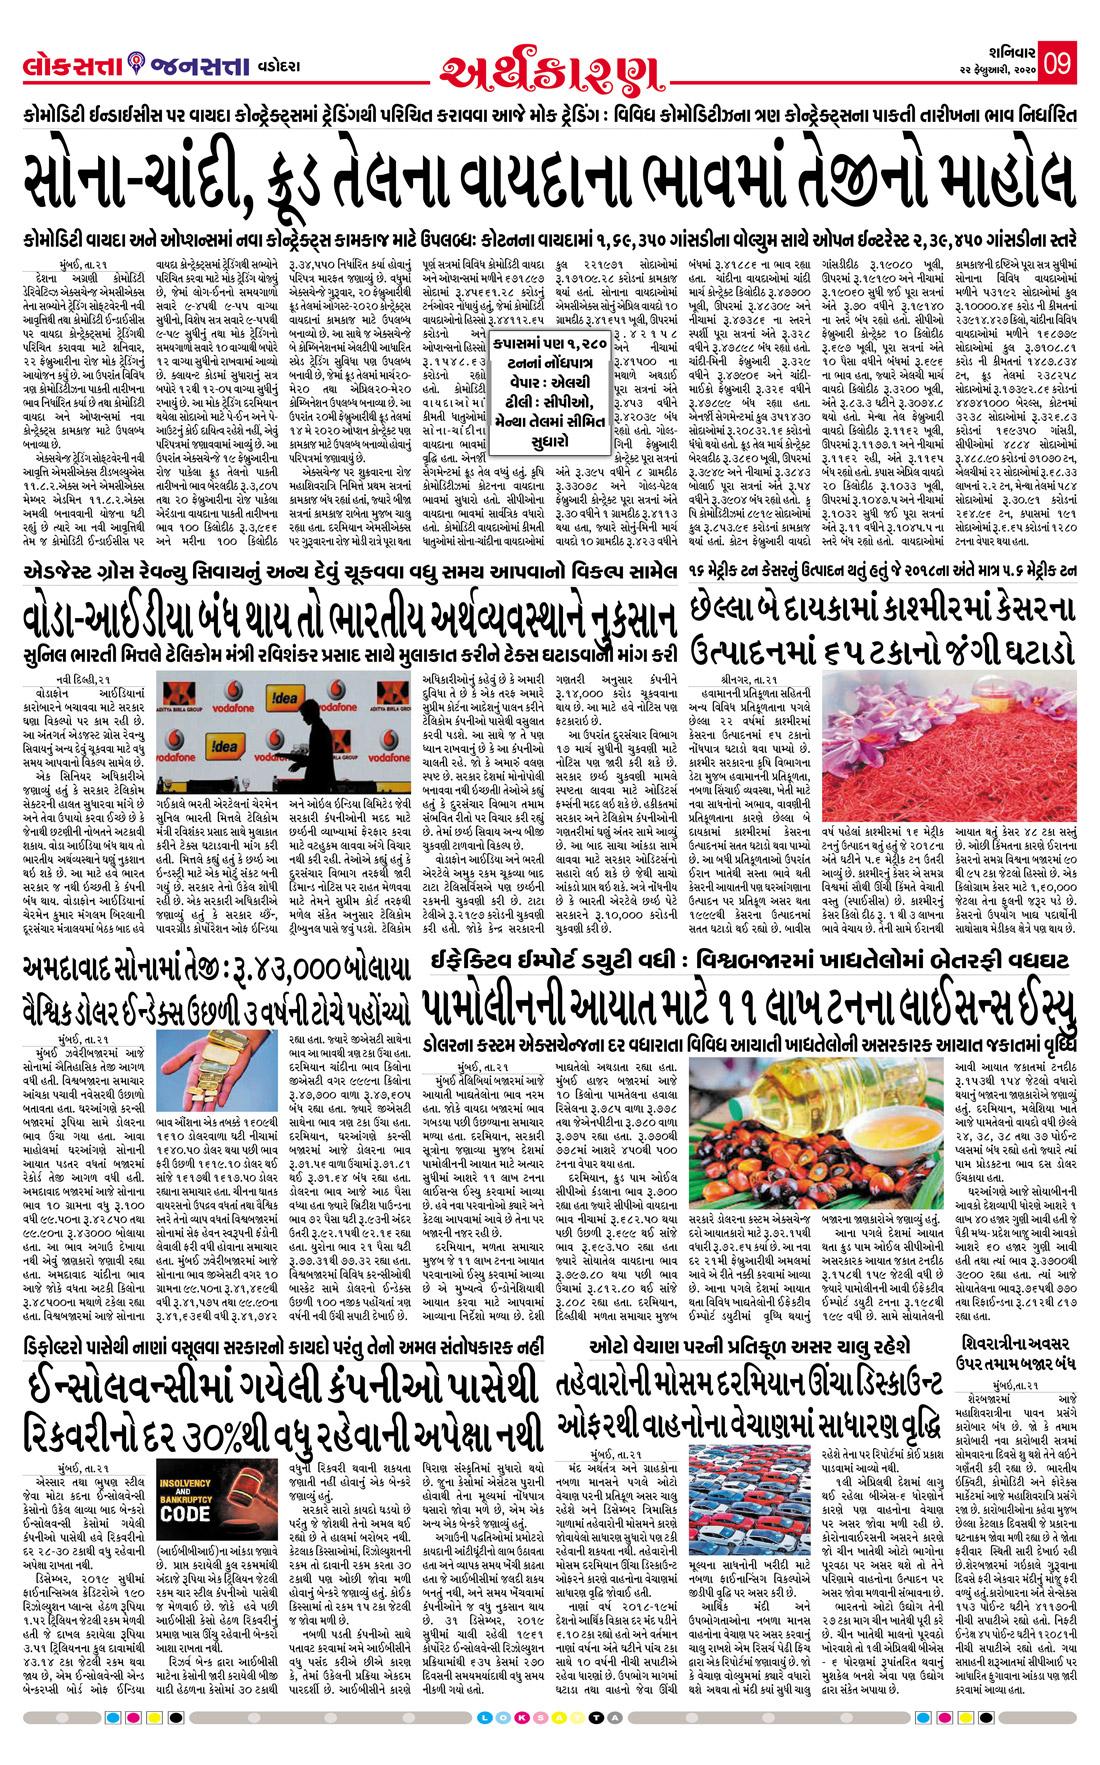 Loksatta Jansatta News Papaer E-paper dated 2020-02-22 | Page 9